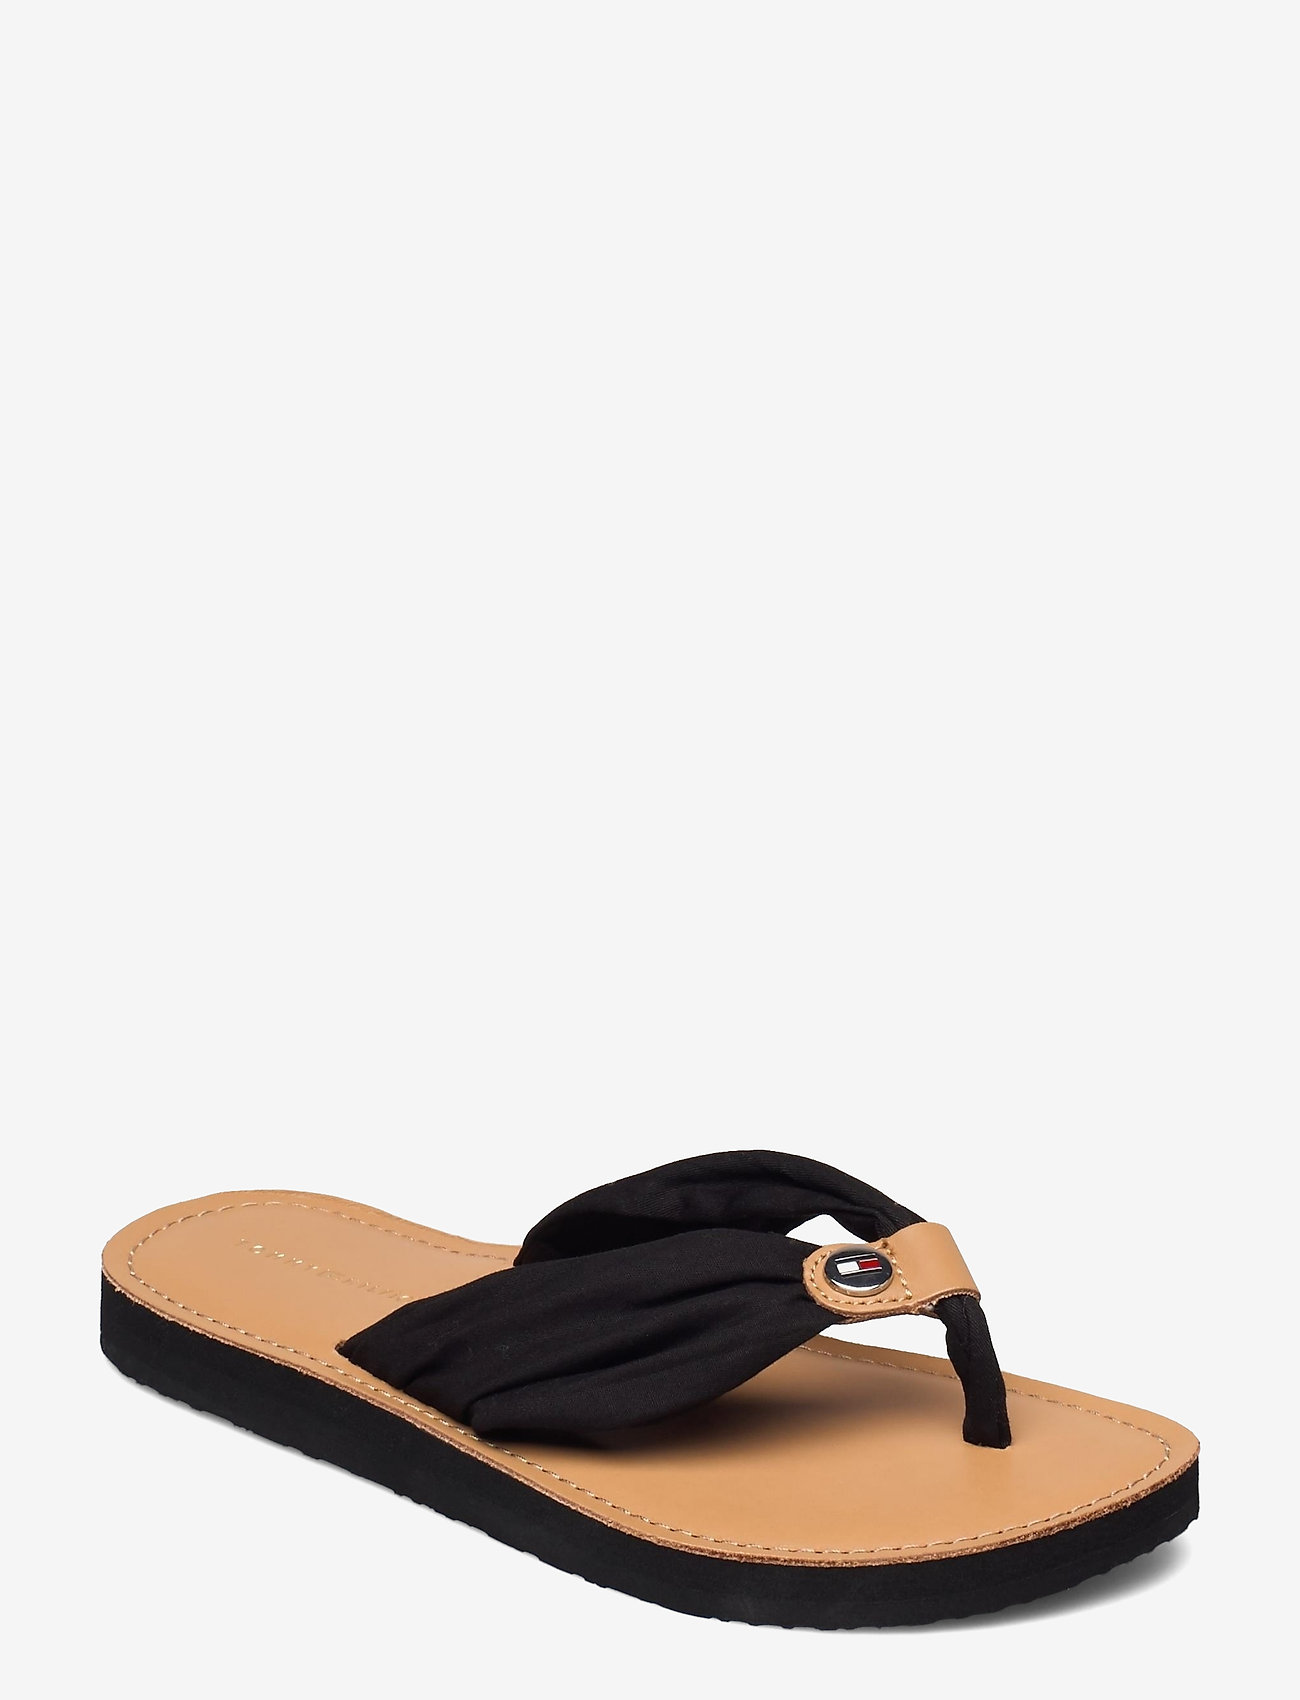 Tommy Hilfiger - LEATHER FOOTBED BEACH SANDAL - flat sandals - black - 0